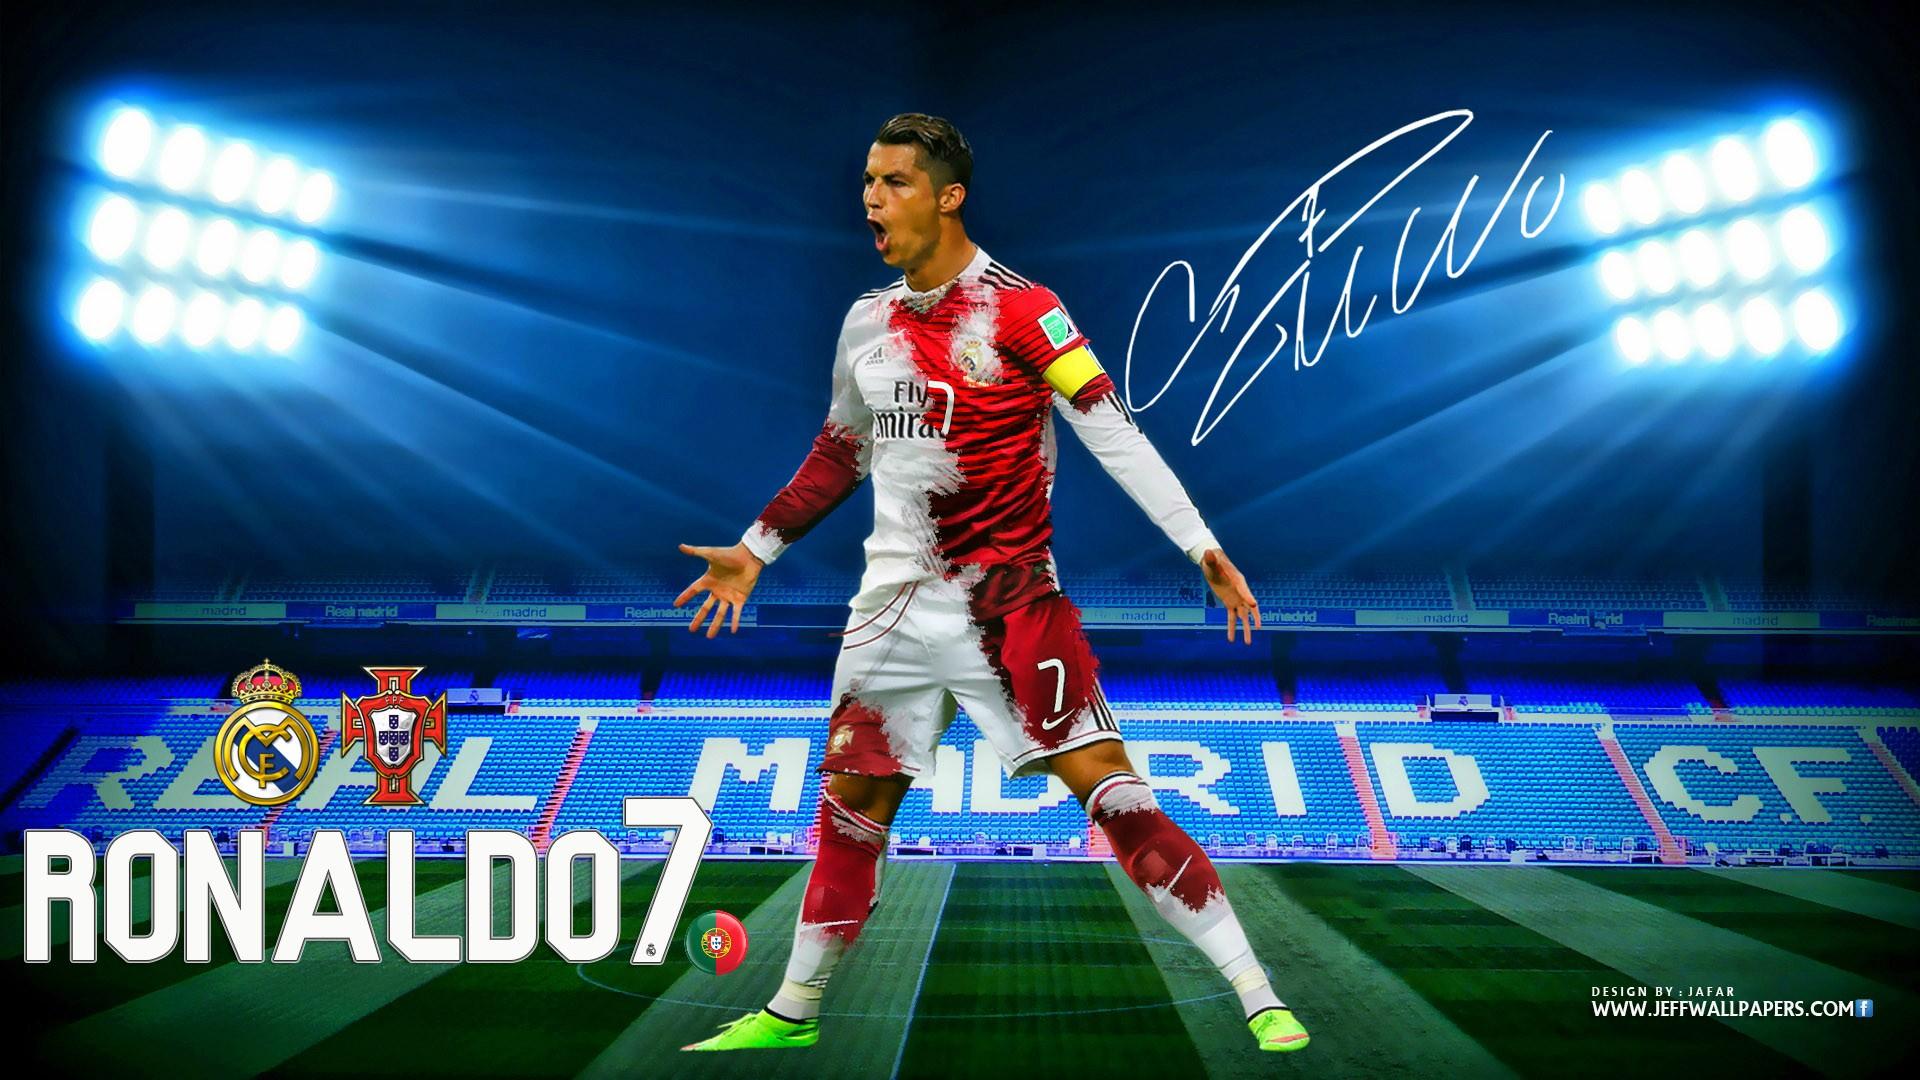 Ronaldo CR7 Real Madrid Kit 2015 HD Wallpaper Search more high 1920x1080